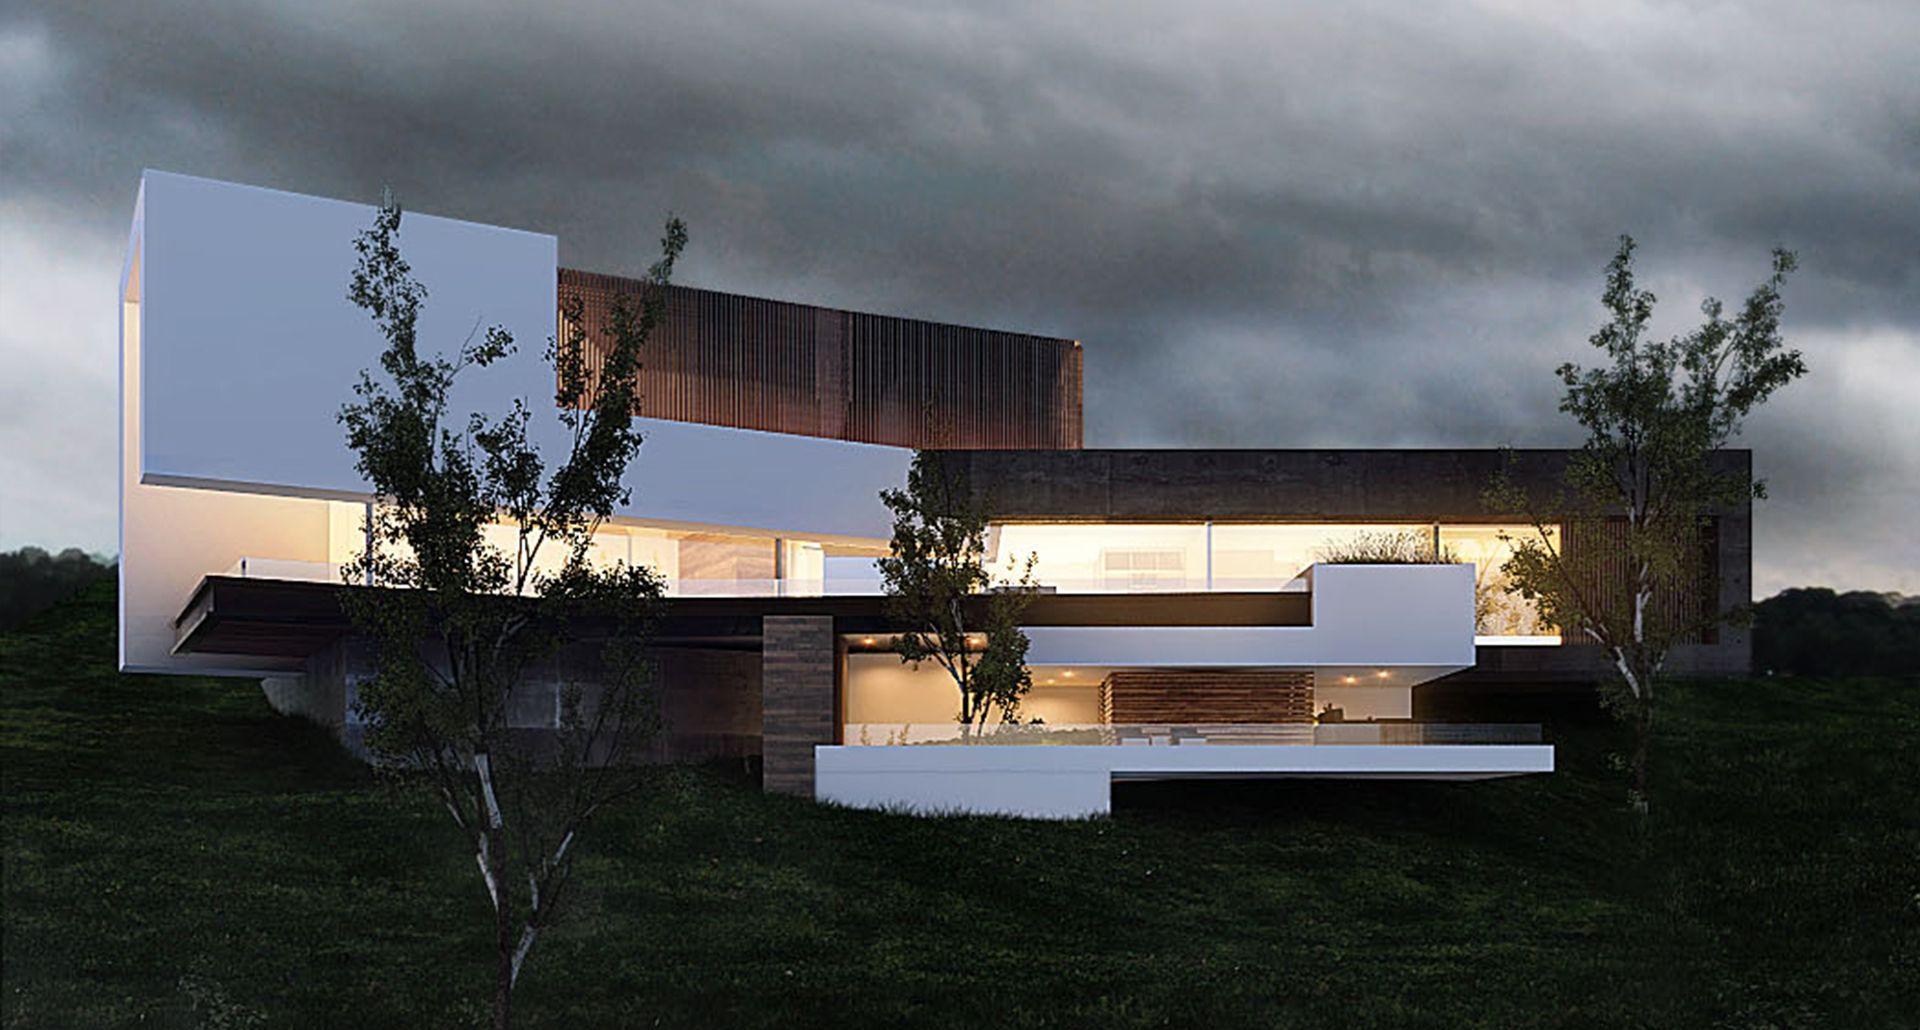 Cyprus villa creato arquitectos arquiyeah pinterest - Disenar mi propia casa ...